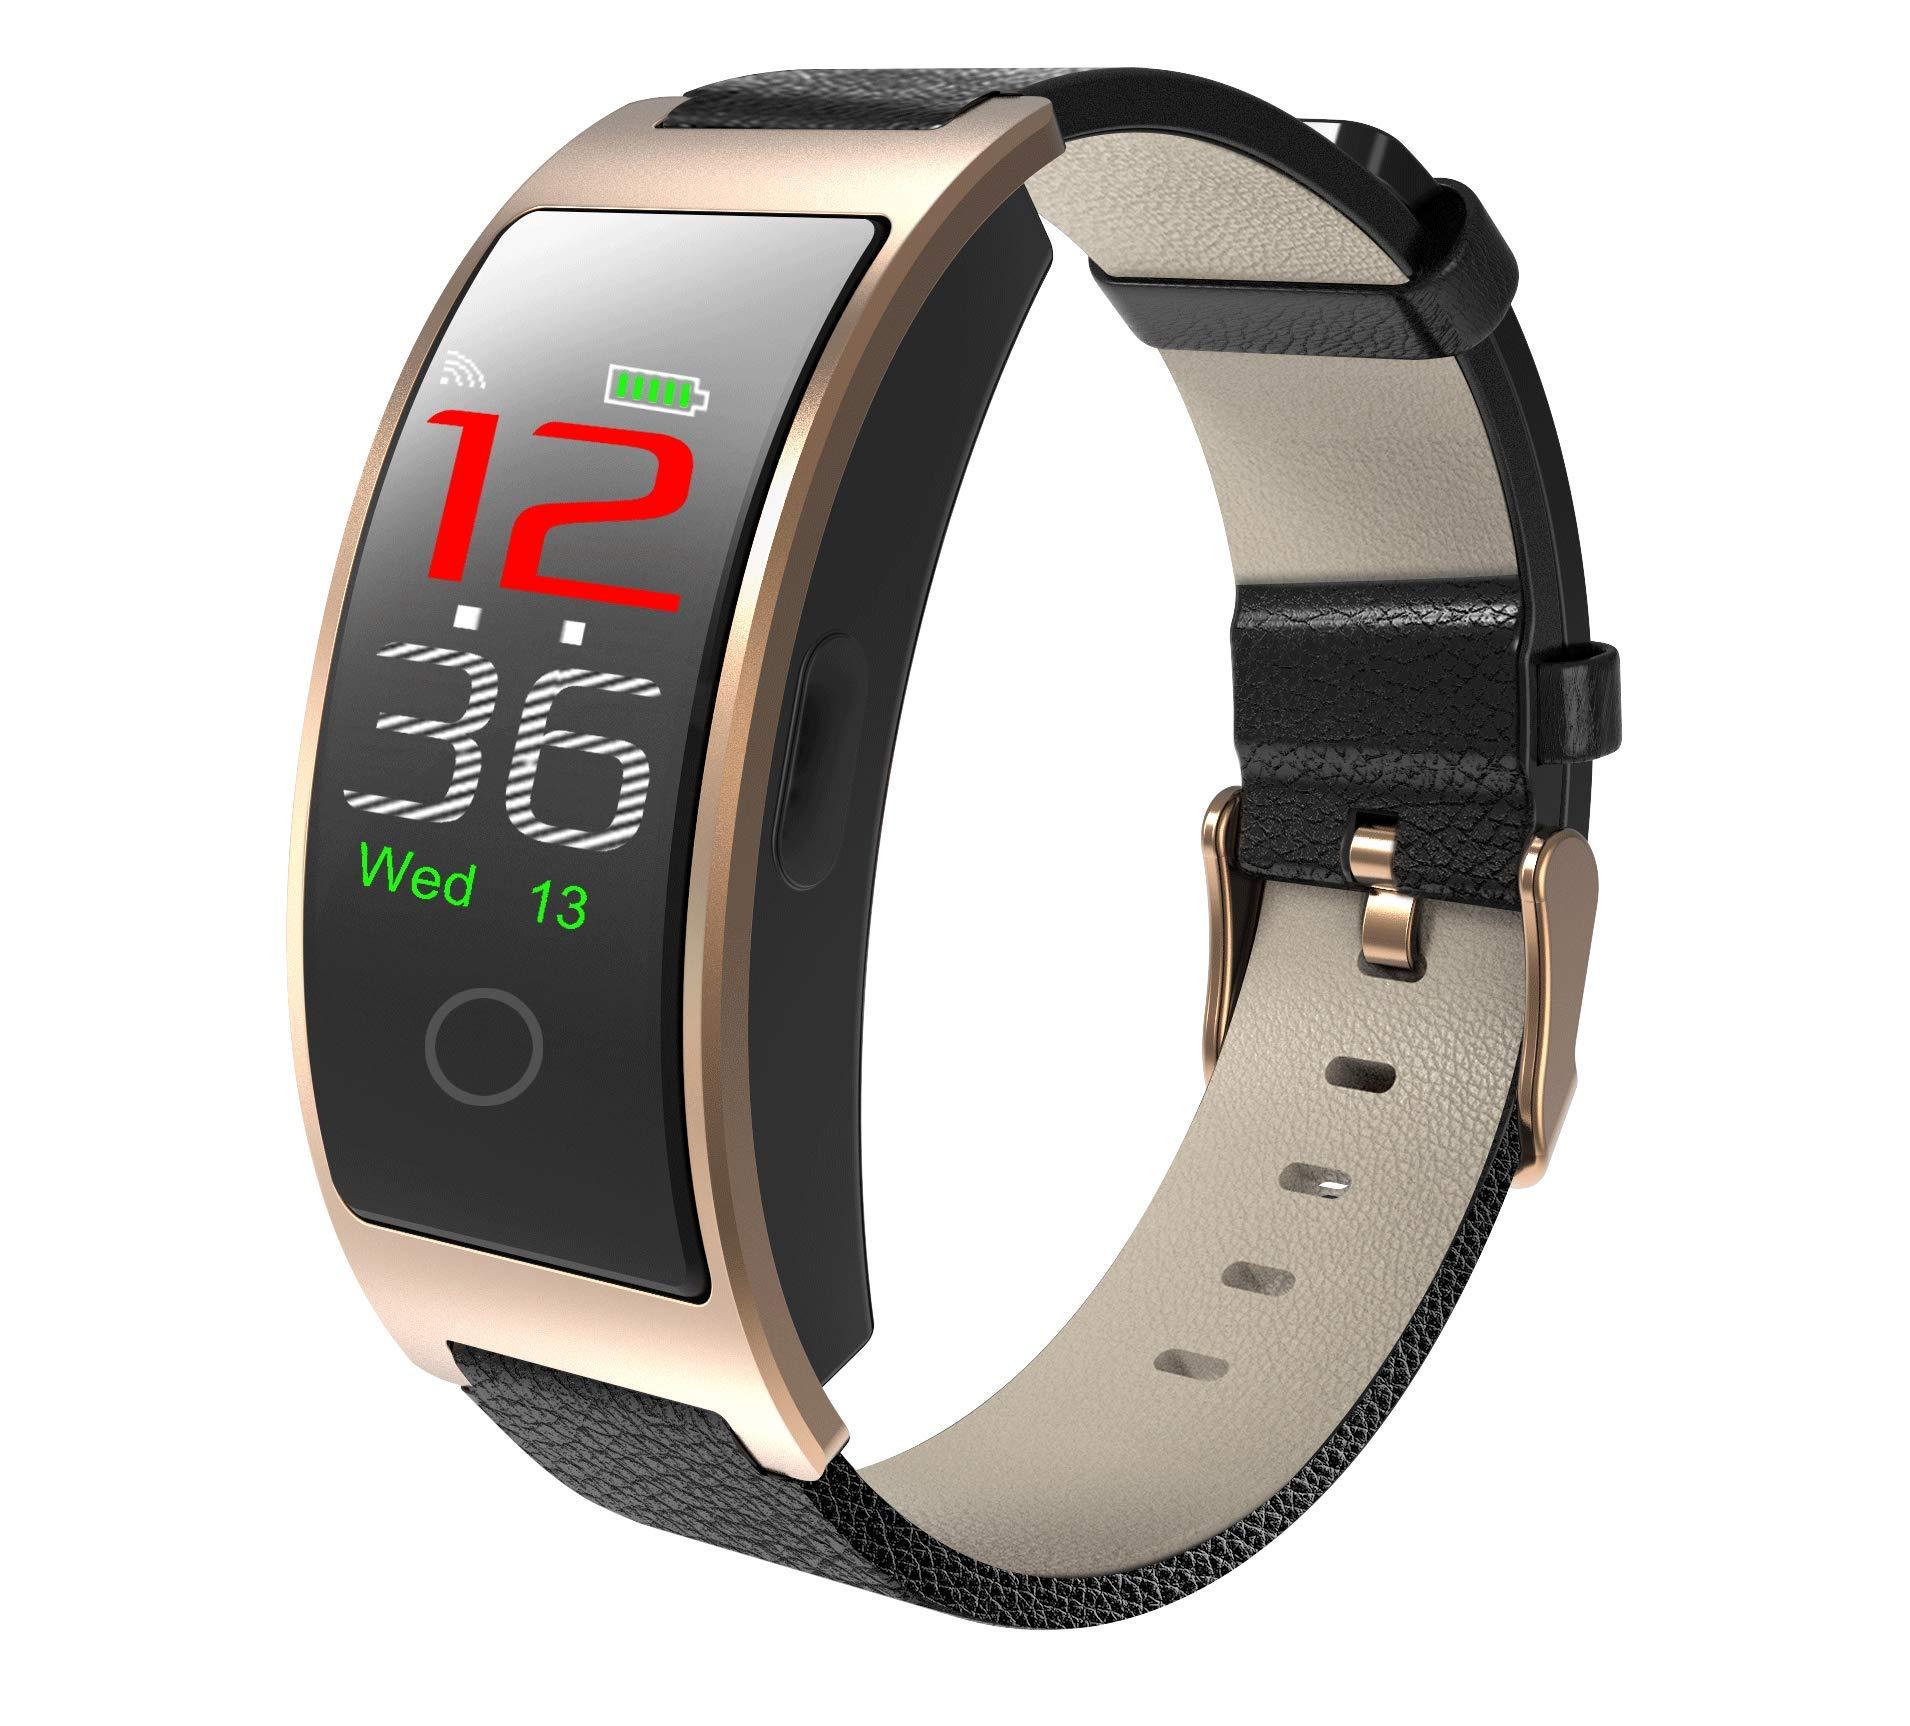 SPORS Fitness Tracker cinturón Impermeable Ritmo cardíaco presión Arterial sueño Monitor podómetro Reloj Inteligente… 1